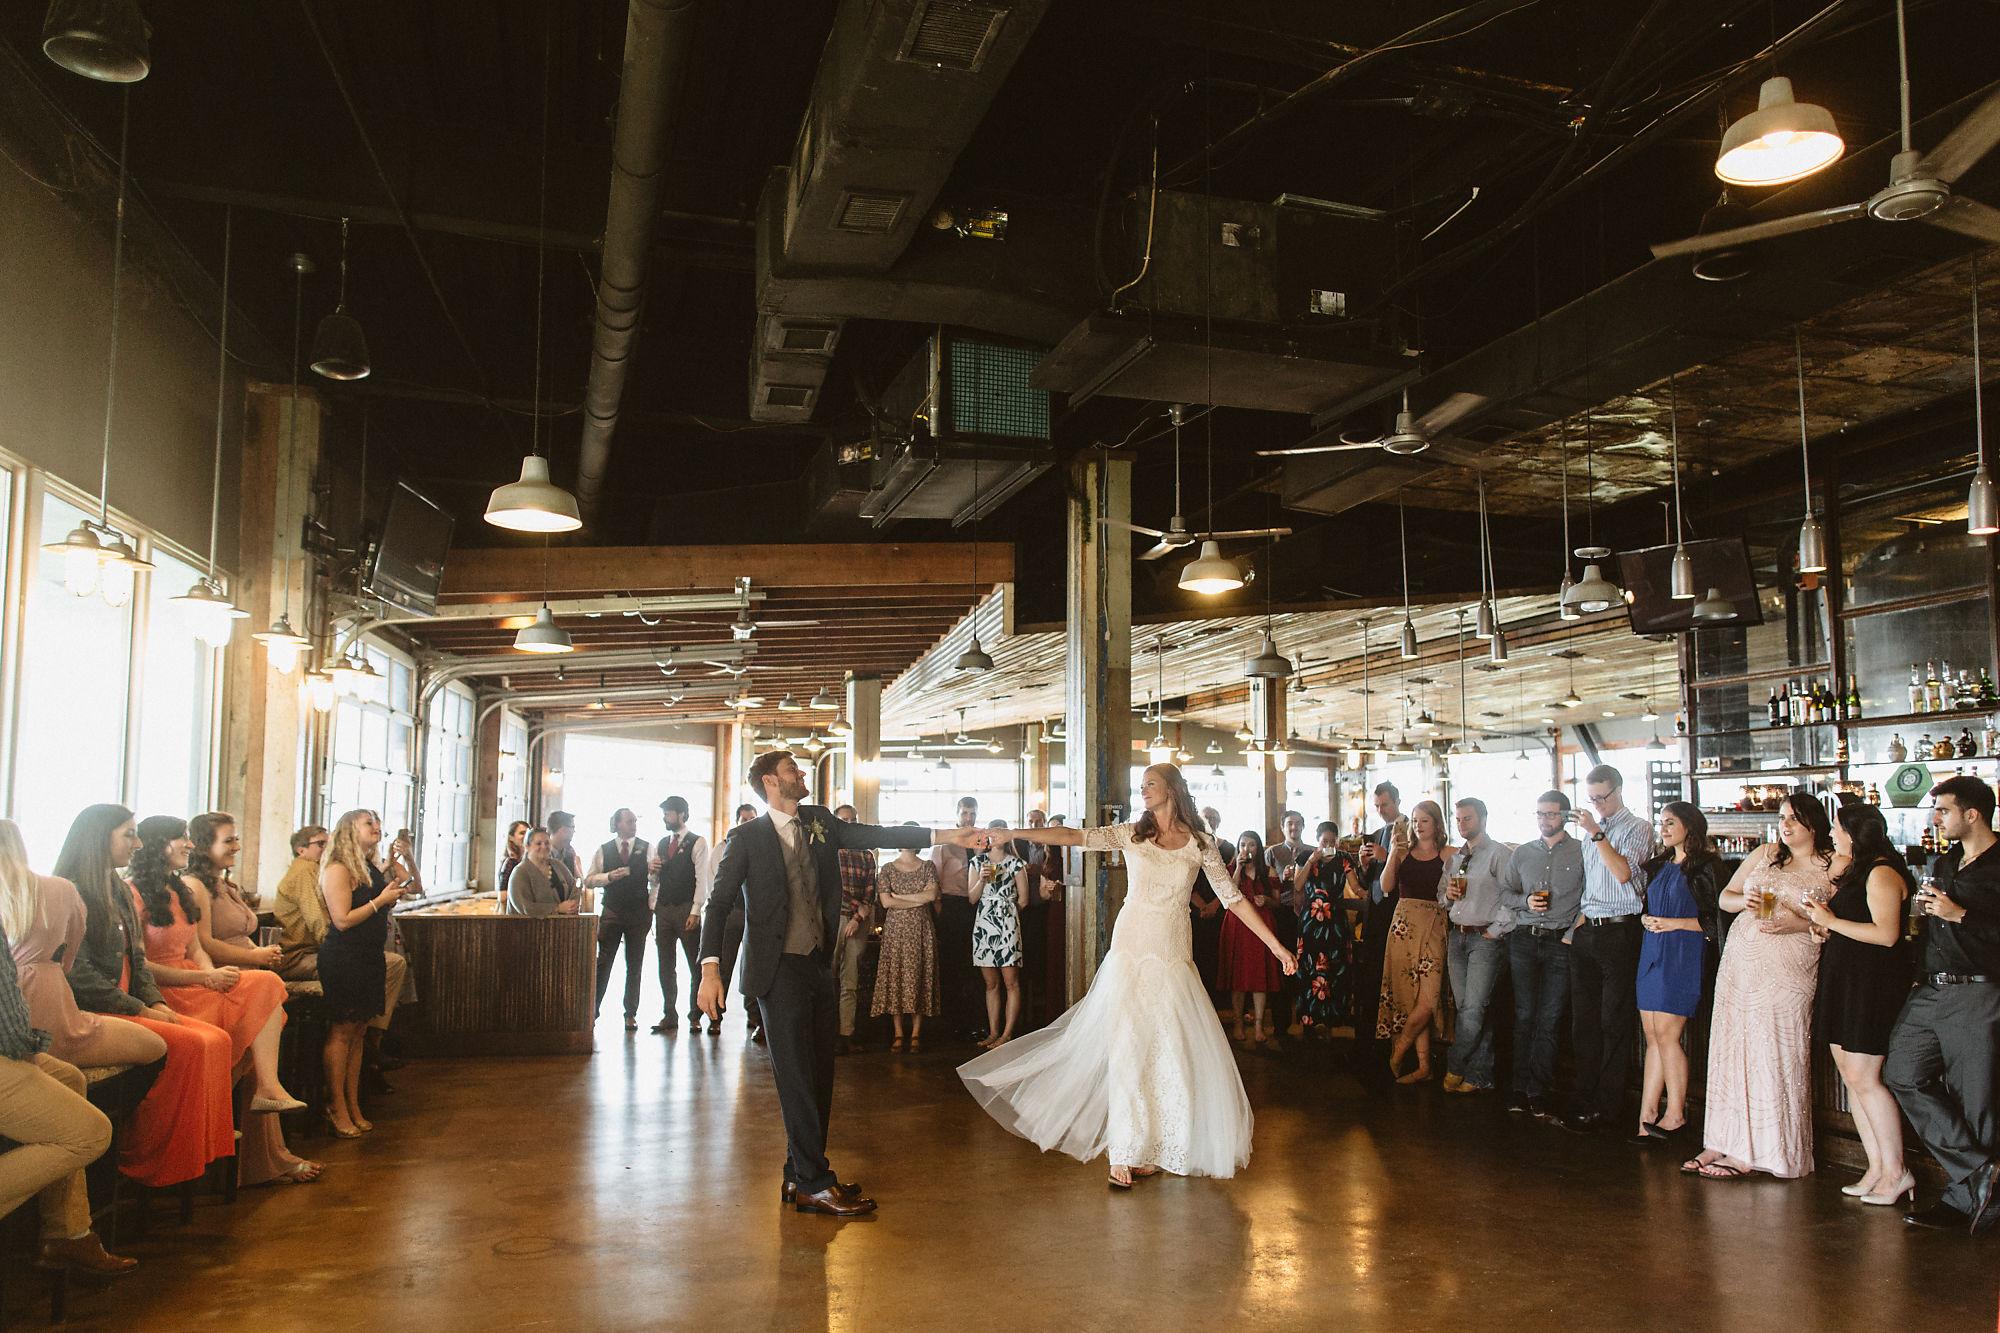 jessica_austin_oasis_brewery_wedding_photos153446.jpg